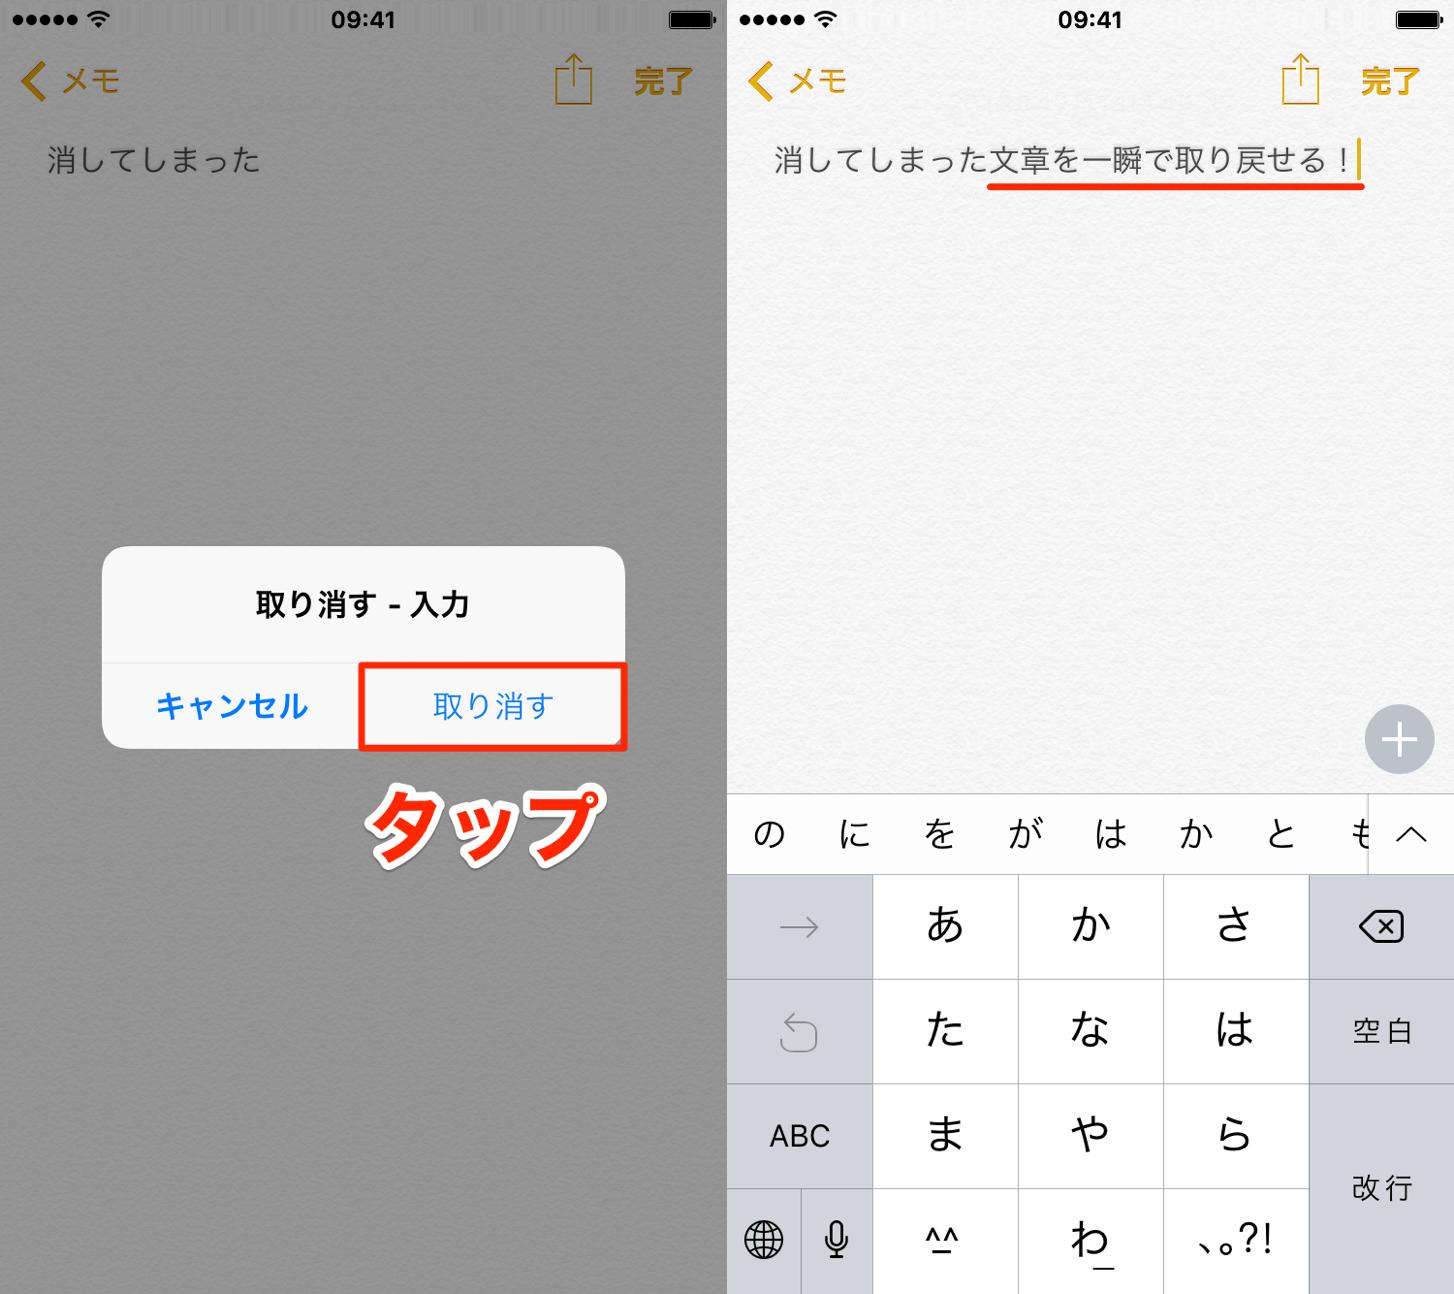 IPhoneのシェイクで文章が復活